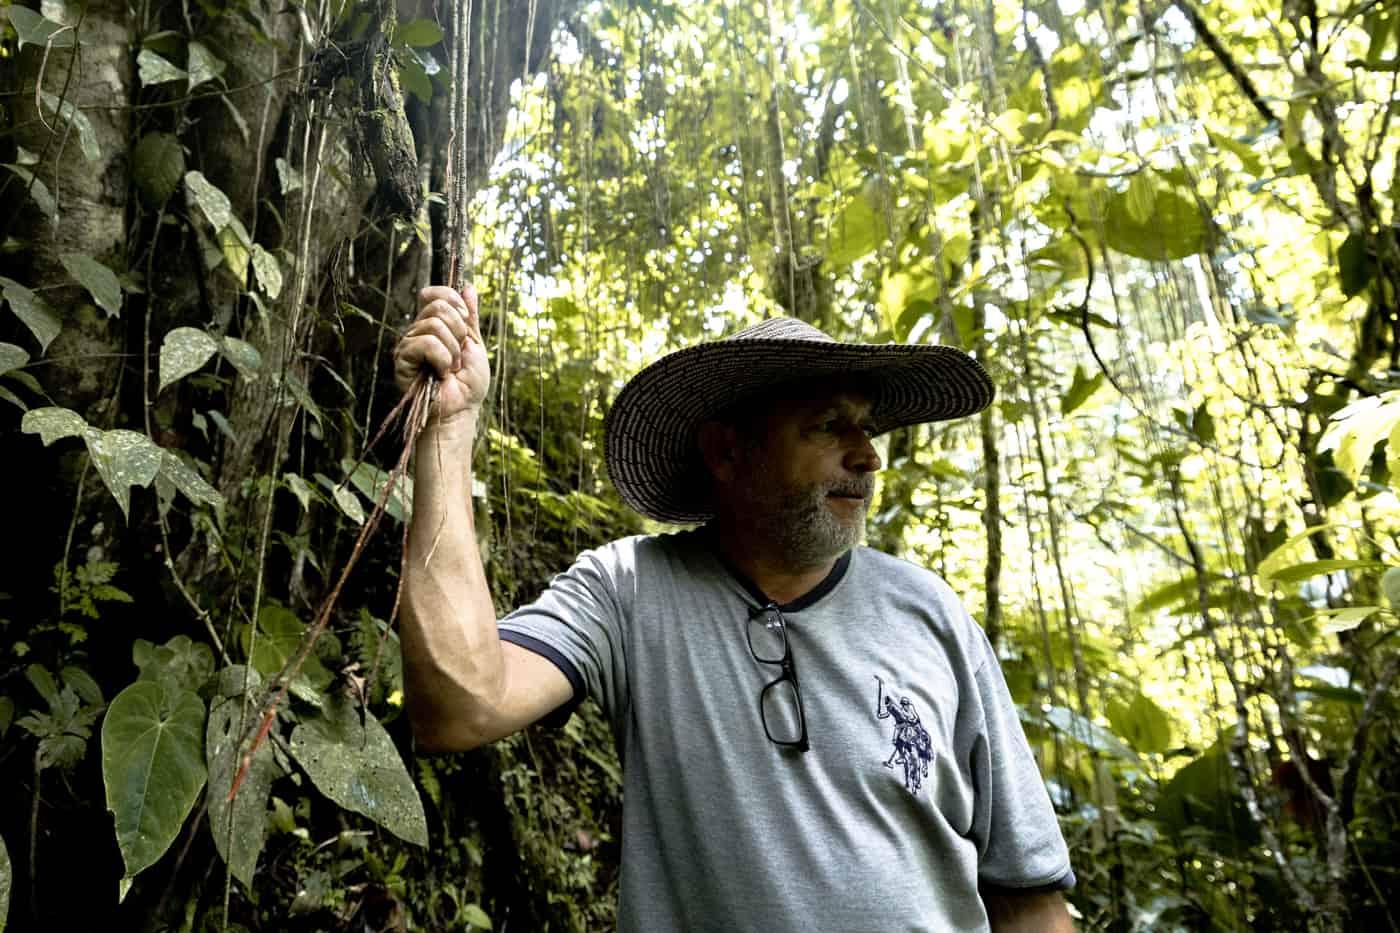 A Coffee Farmer in Colombia